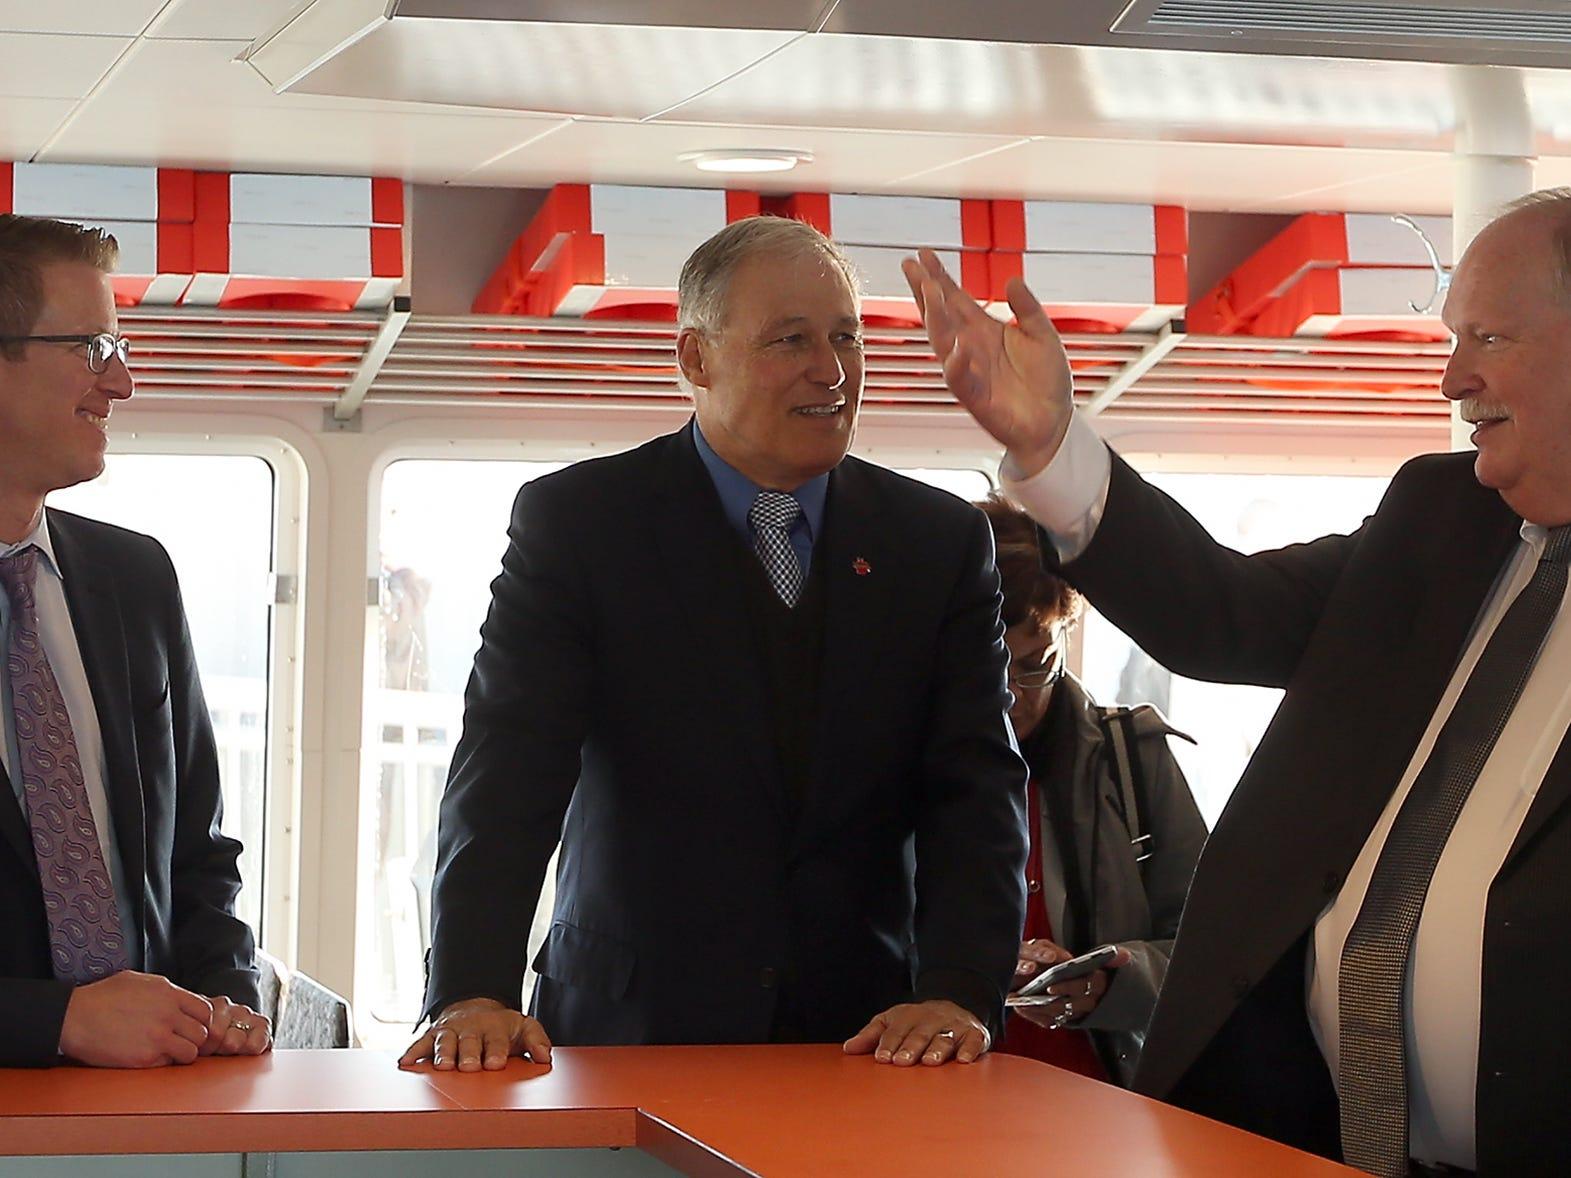 Kitsap Transit executive director John Clauson (right) talks with Jay Inslee (center) and  U.S. Rep. Derek Kilmer (left) aboard the M/V Finest on Monday, November 19, 2018.